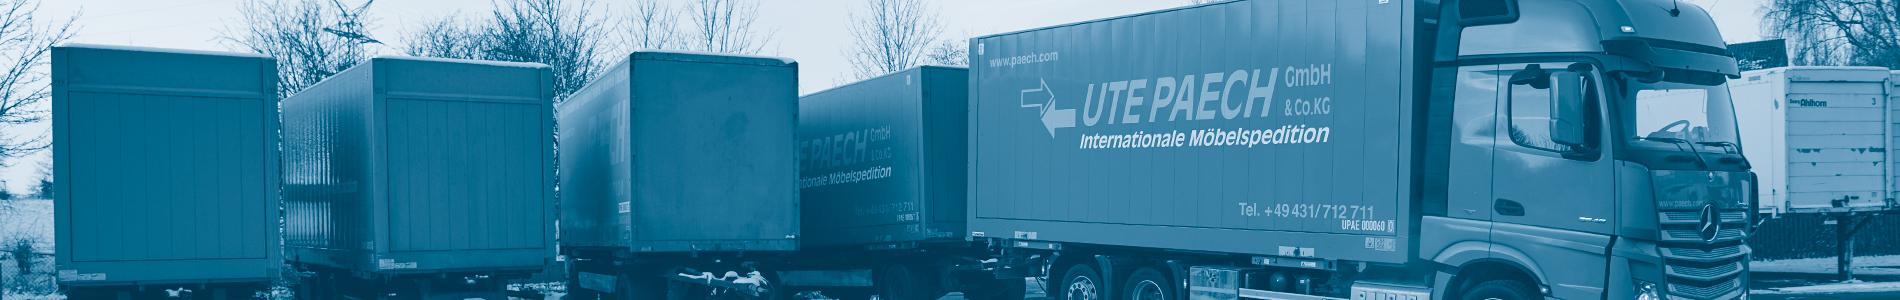 Ute Paech GmbH & Co. KG - Utflyttning